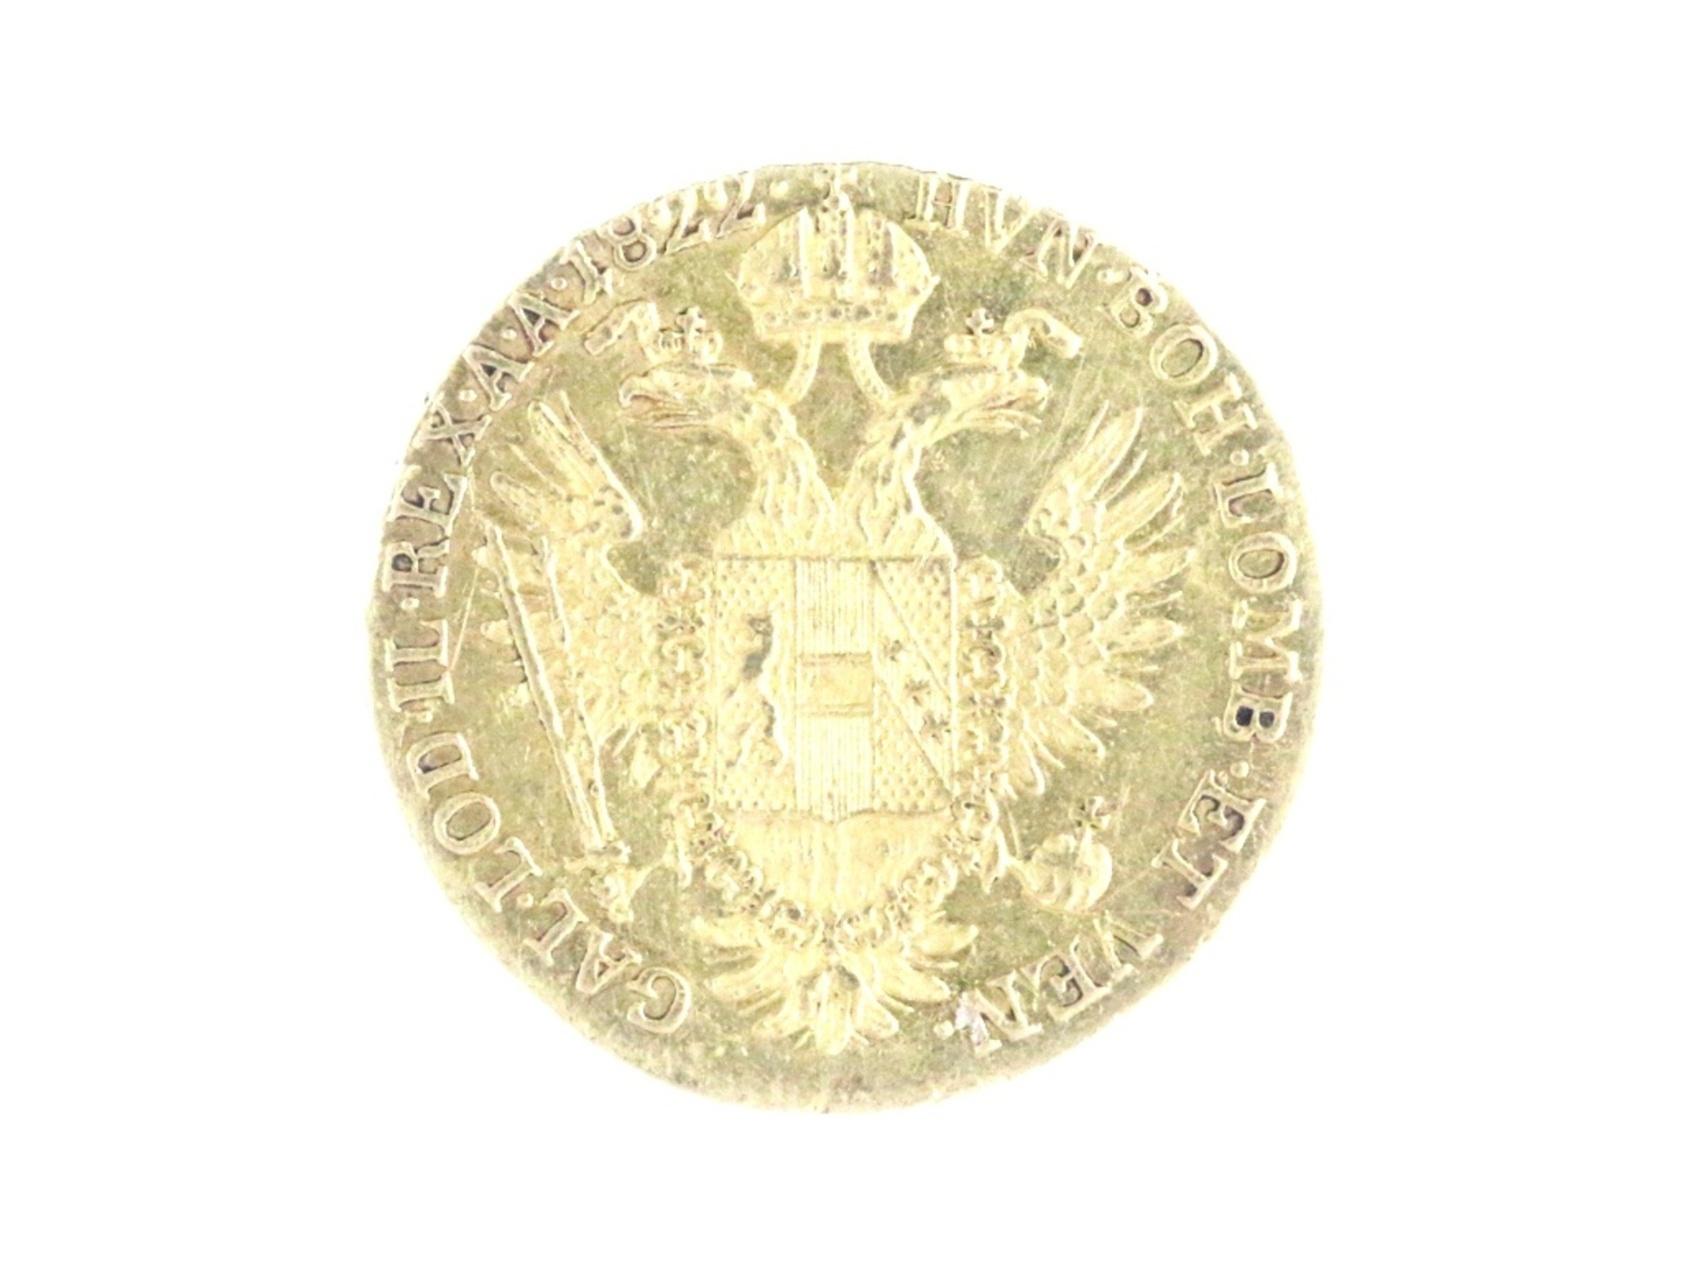 František I. 1792-1835 - Dukát 1822 E, váha 3.48g, N125